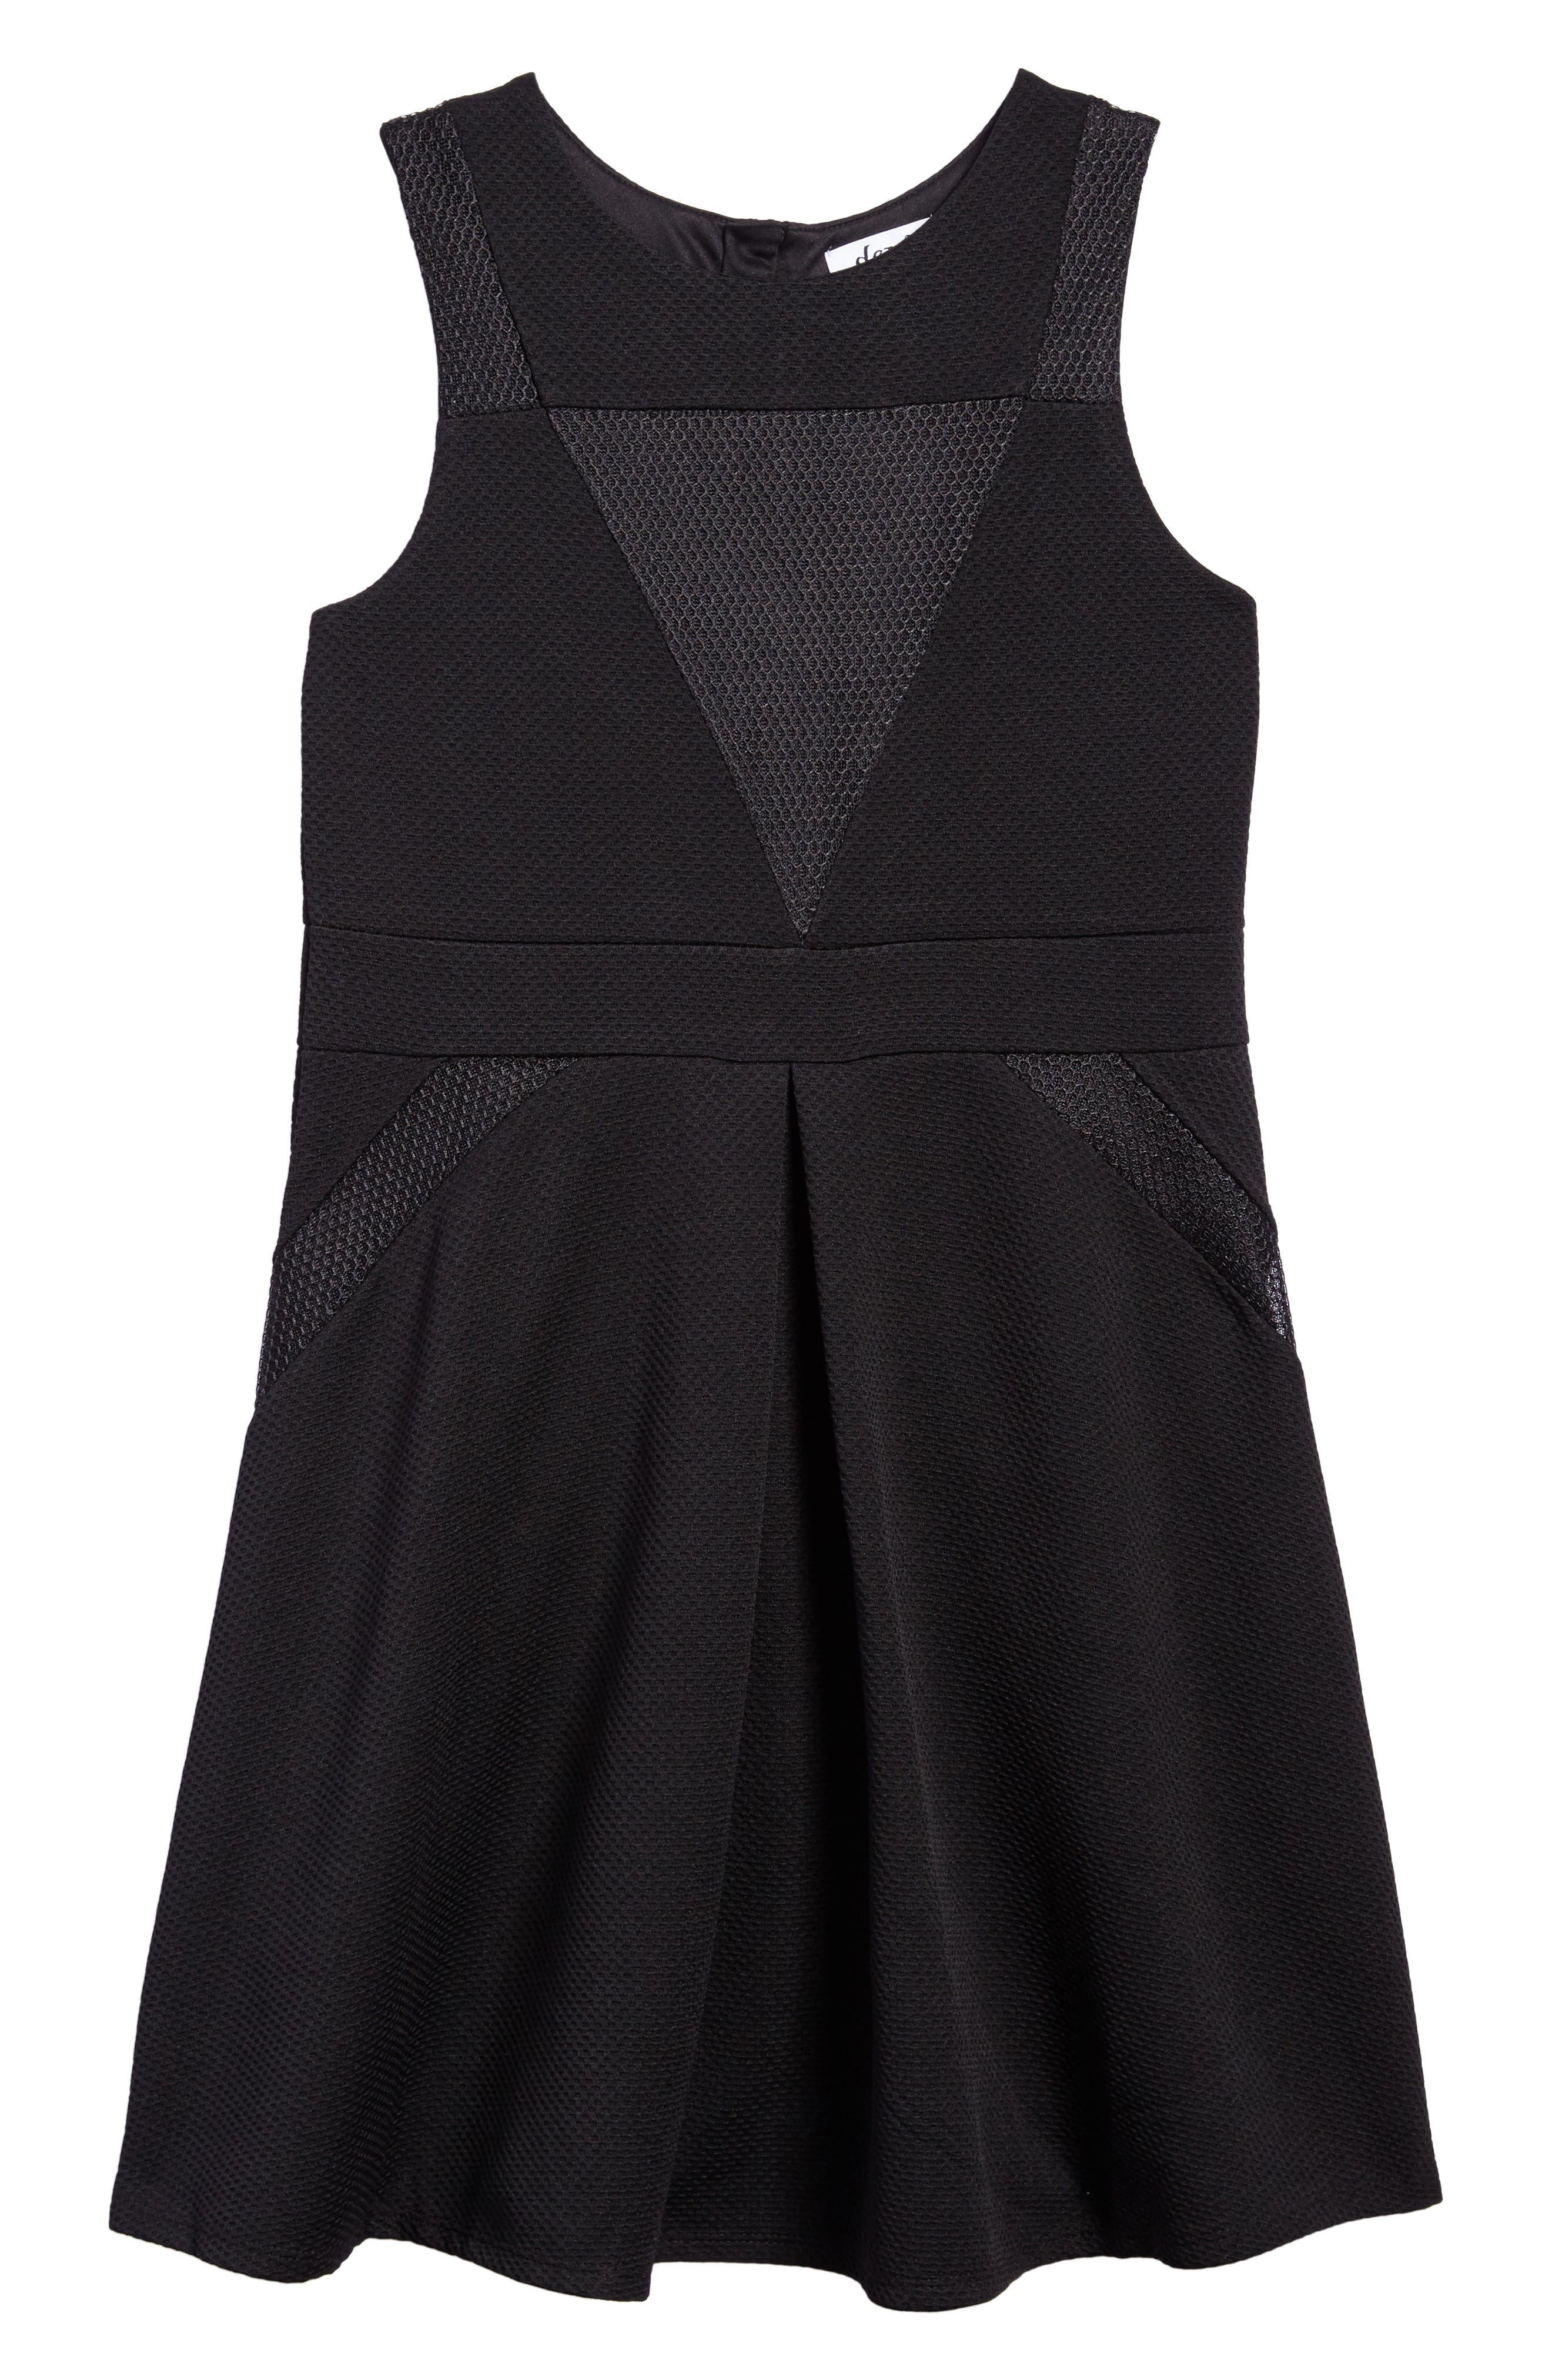 Mesh Skater Dress,                         Main,                         color, Black